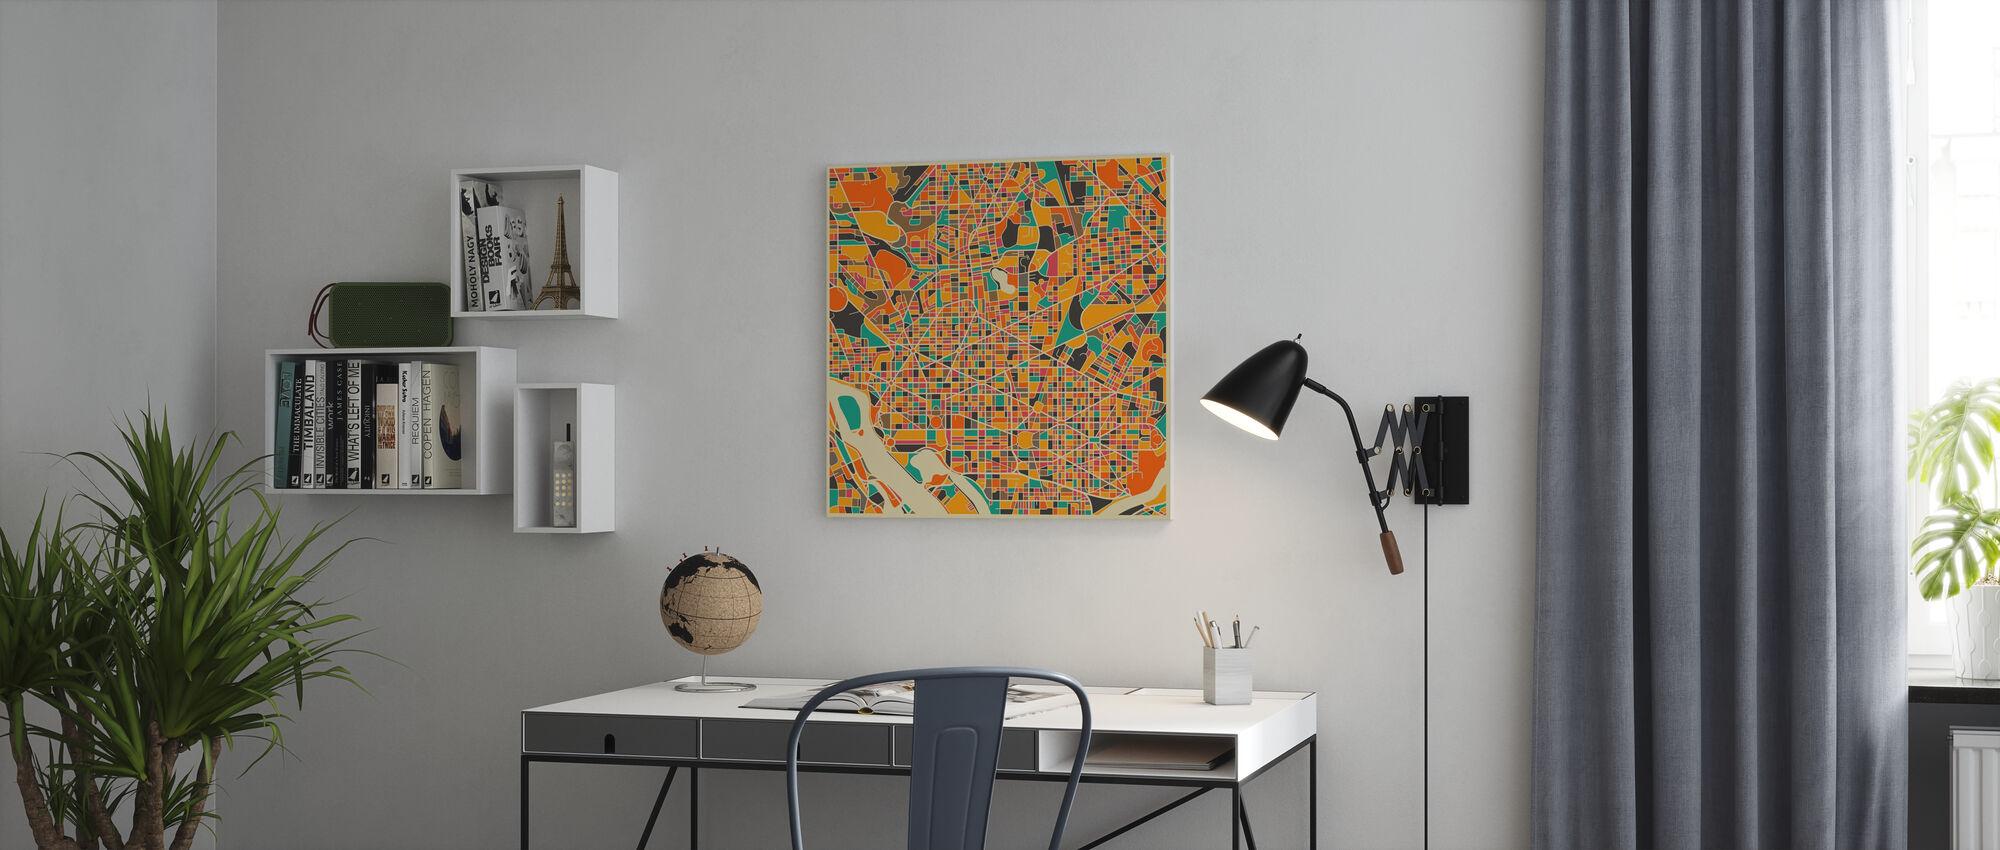 Multicolor Map - Washington - Canvastavla - Kontor